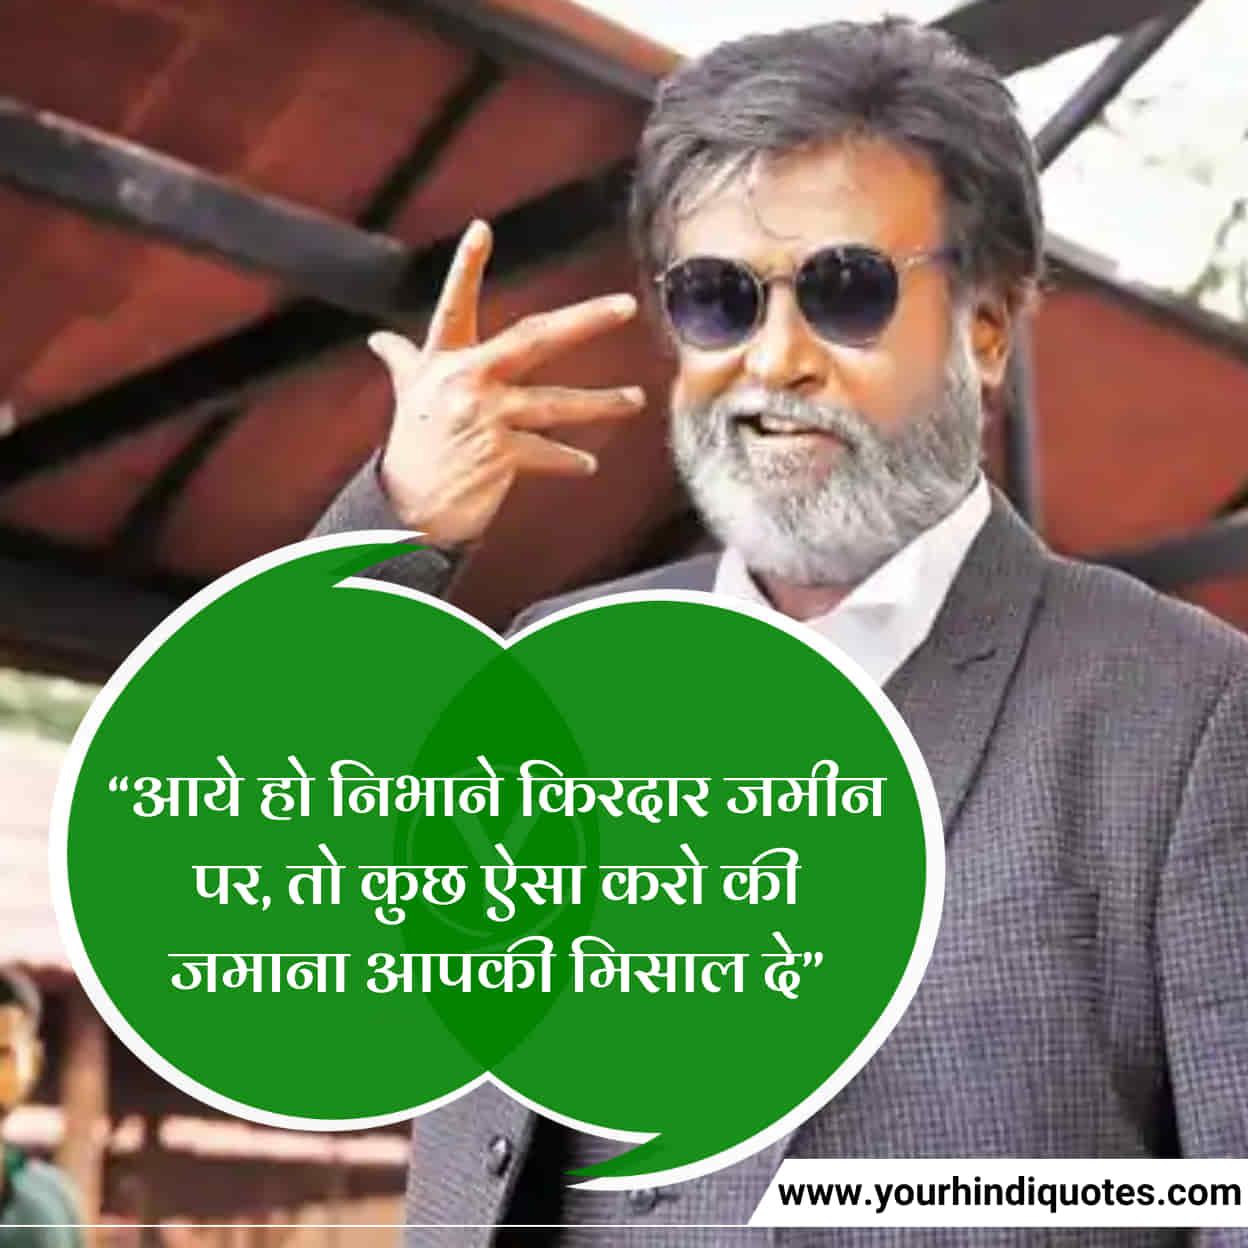 Best Motivational Hindi Status